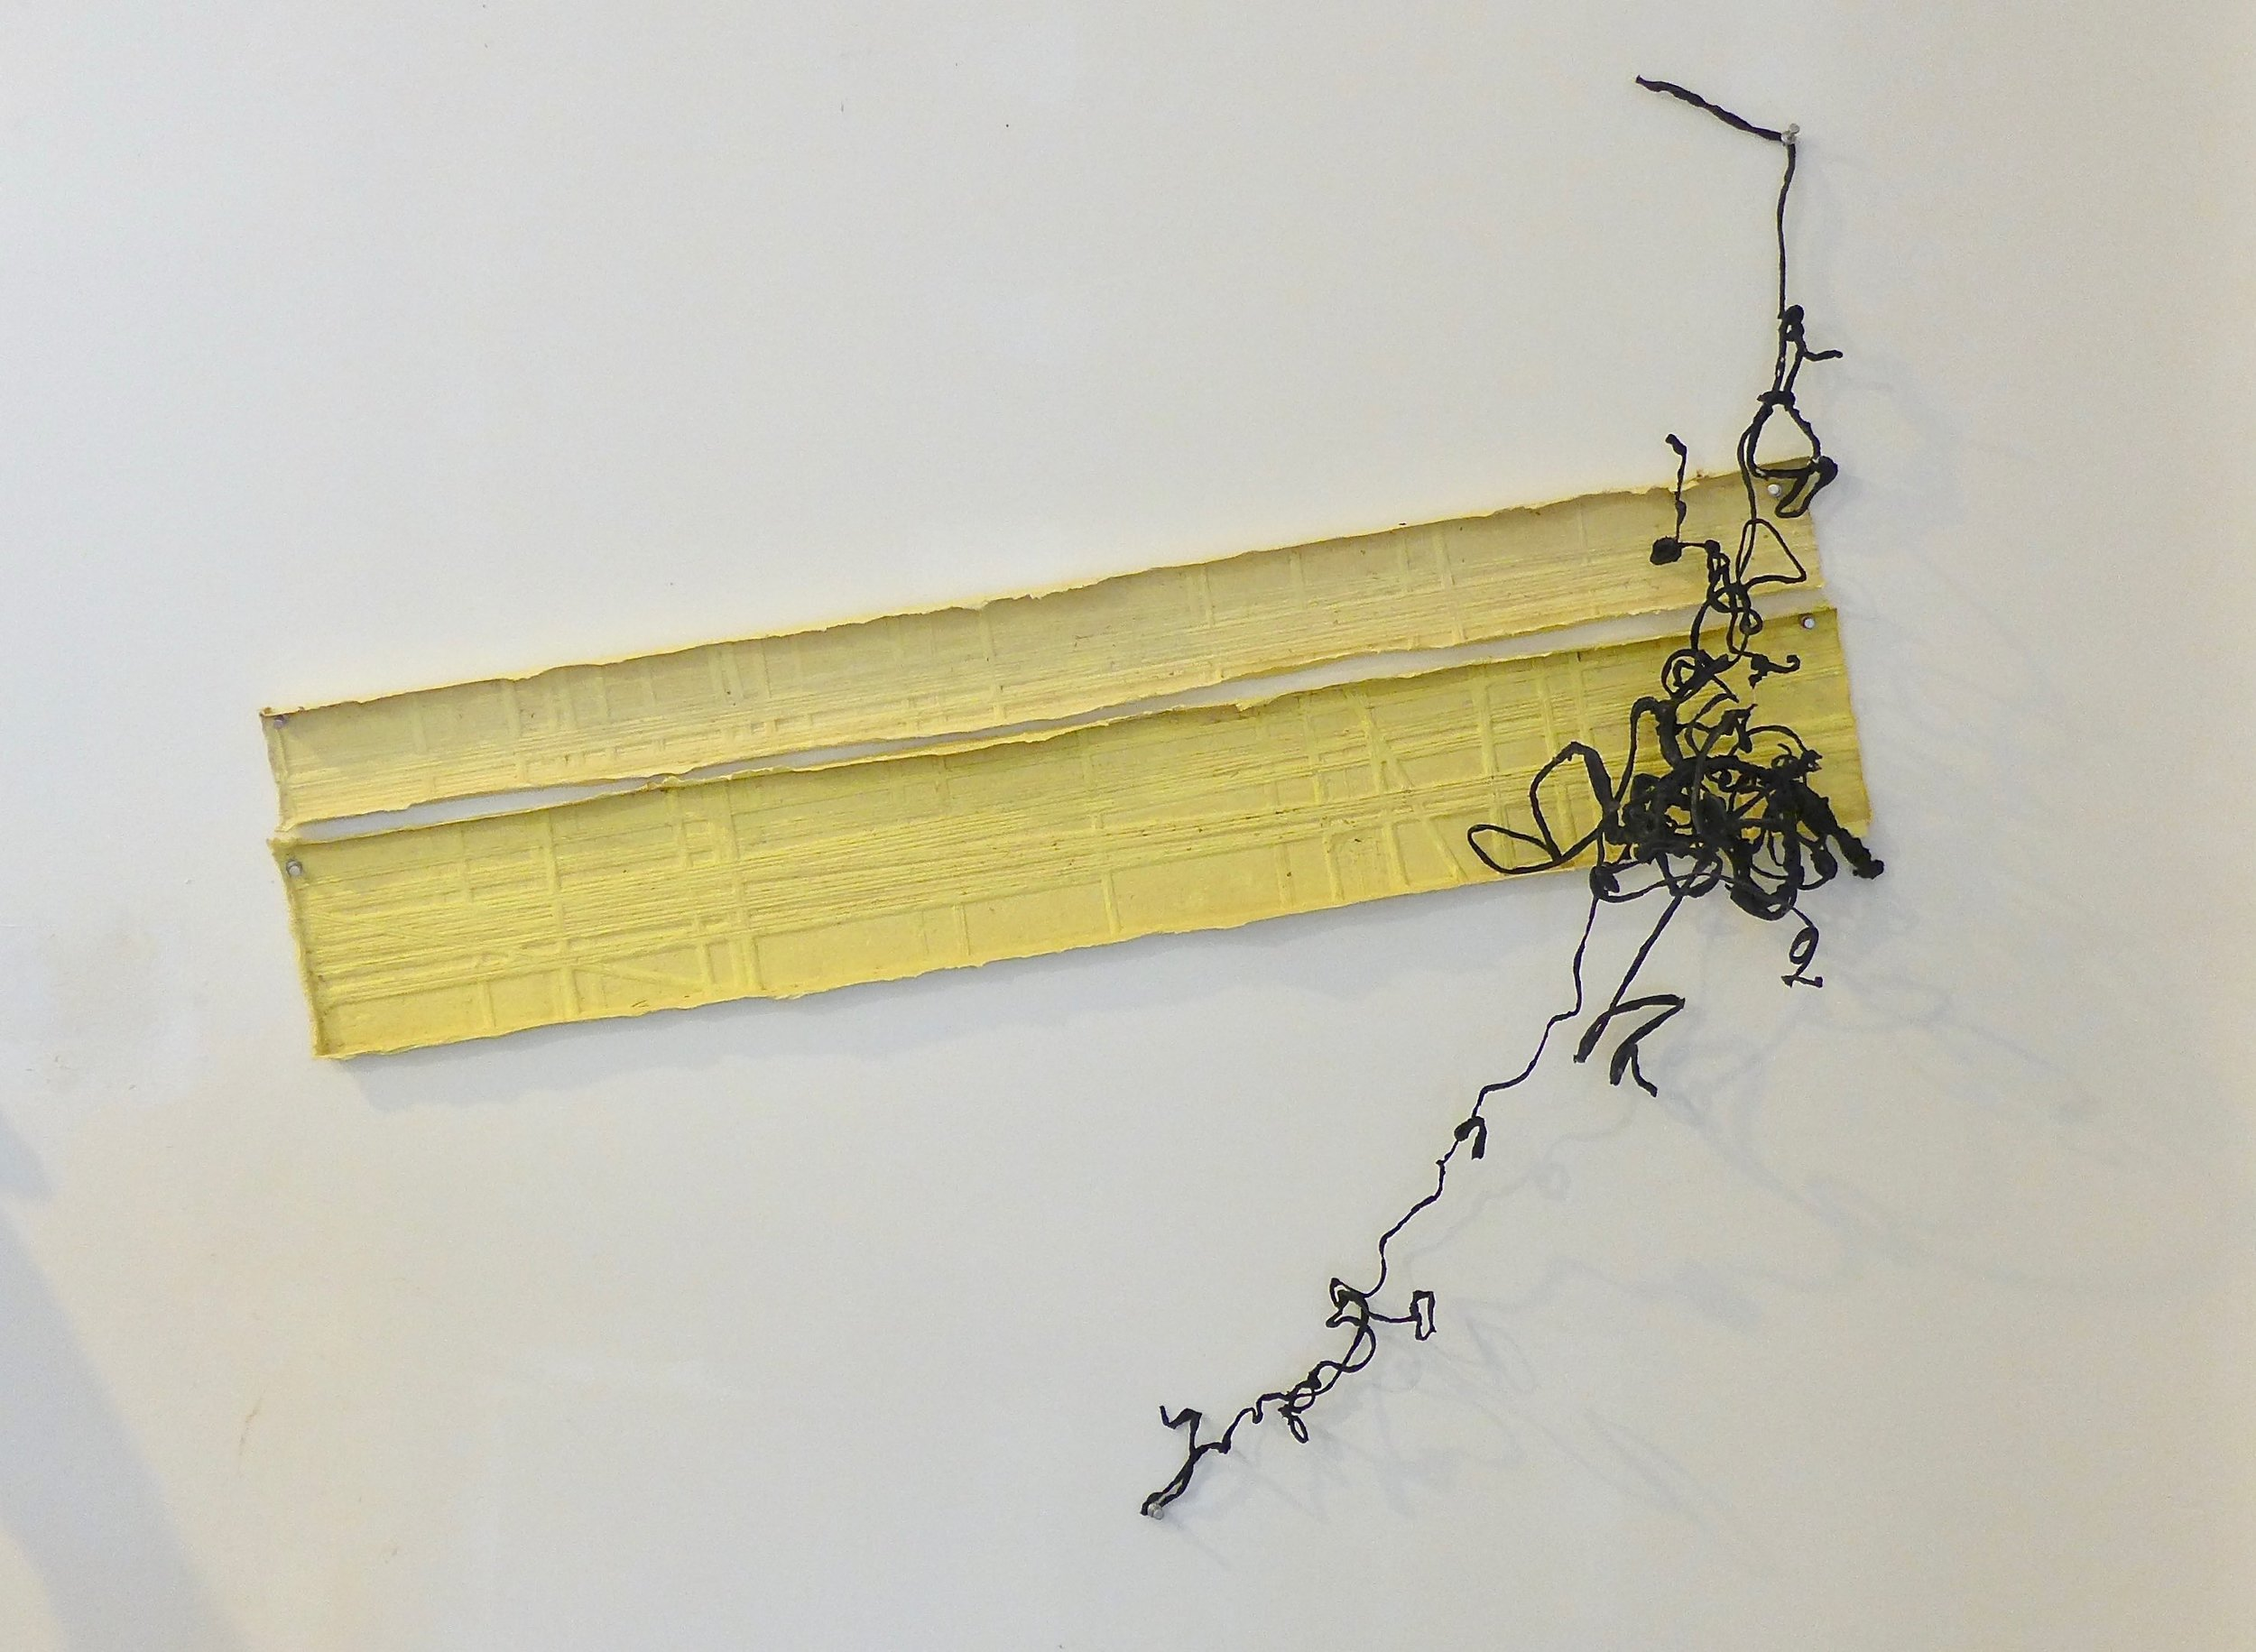 Barbara-Landes-cast-cotton-abaca-sculpture-paper-artwork.jpg